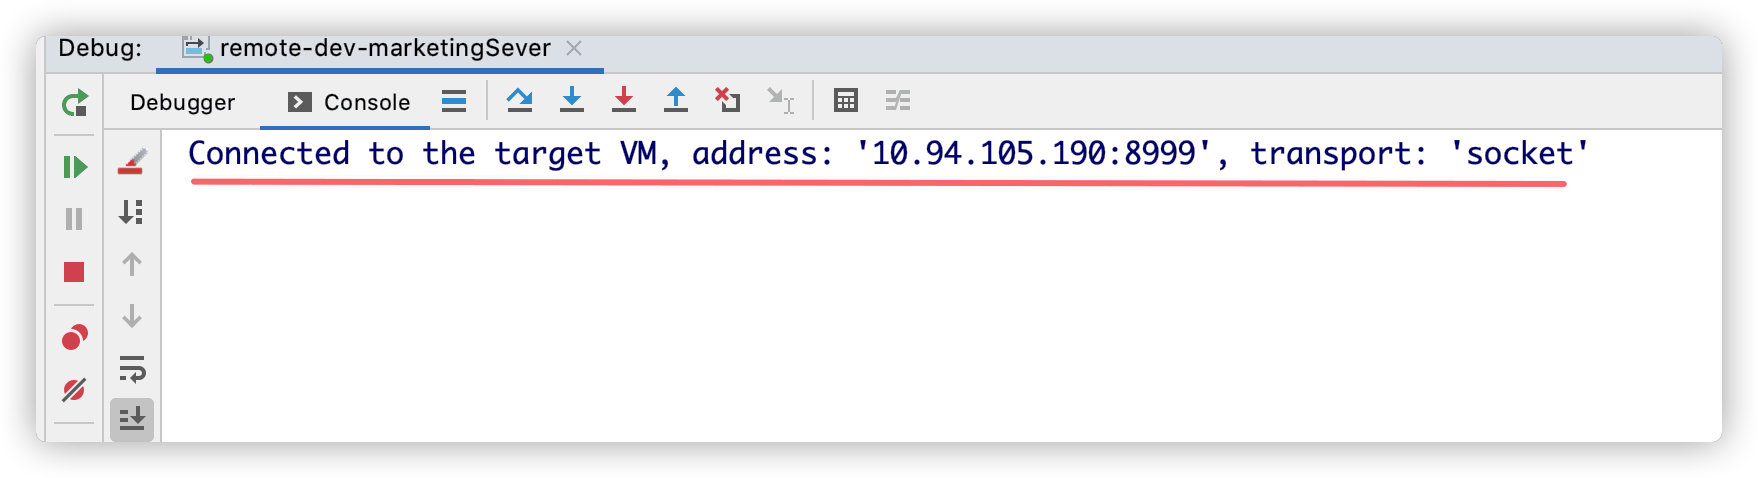 Java 远程 Debug 开发-Python 技术分享 Java技术分享 Python 爬虫技术_微信公众号:zeropython—昊天博客